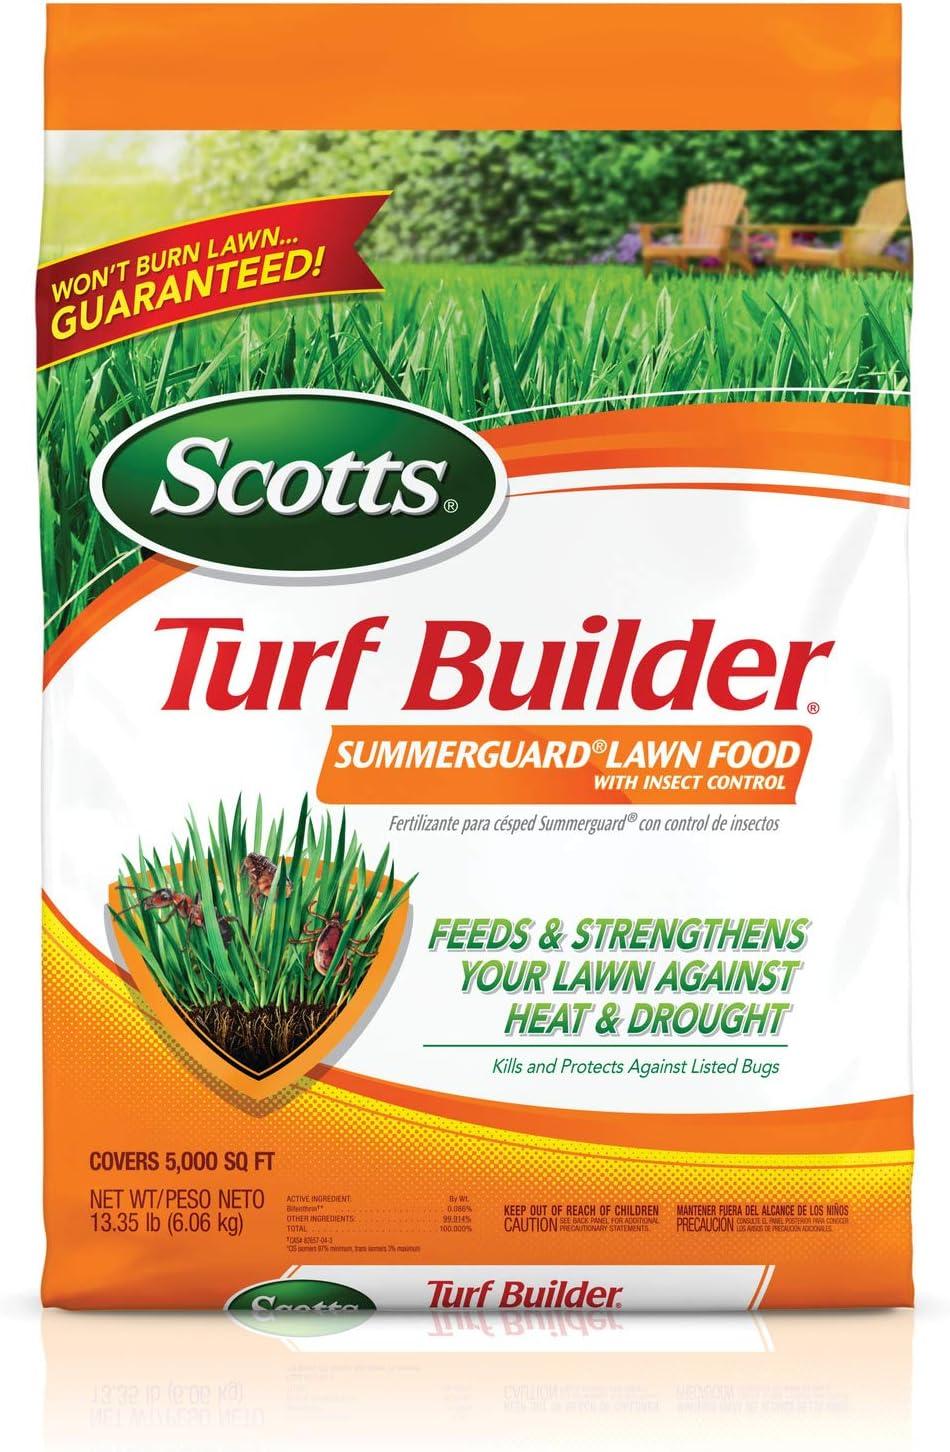 Scotts 49013 Turf Builder SummerGuard Lawn Food